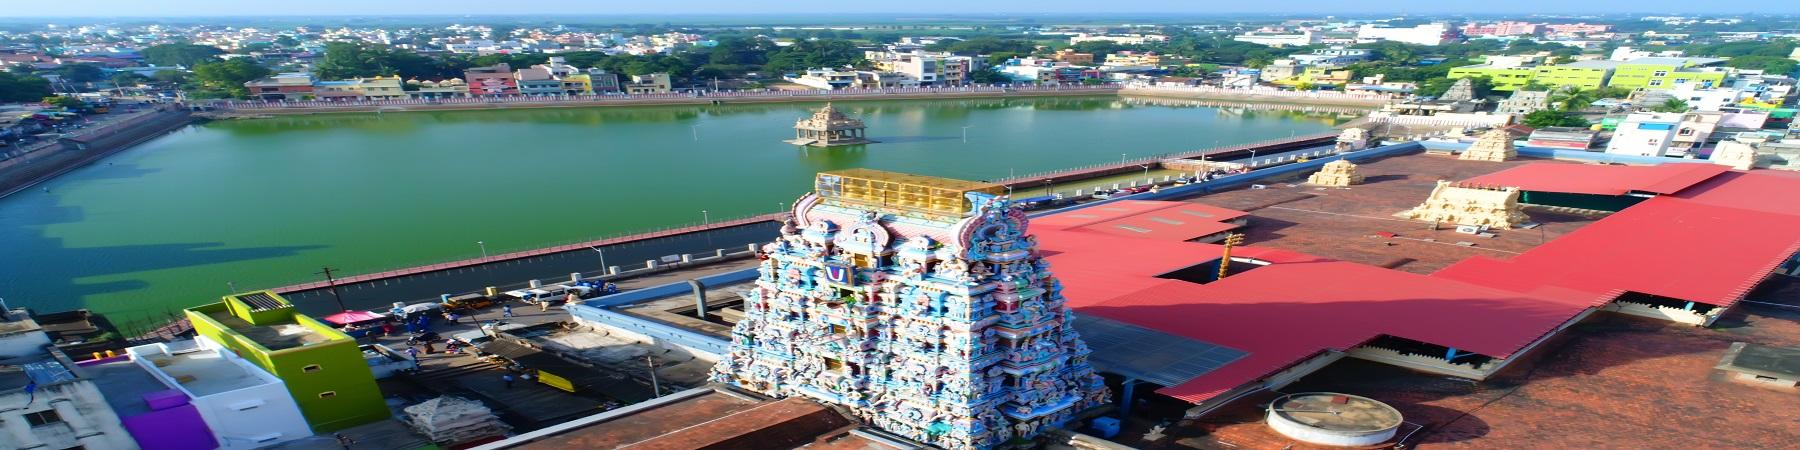 Veeraraghava Temple Aerial View